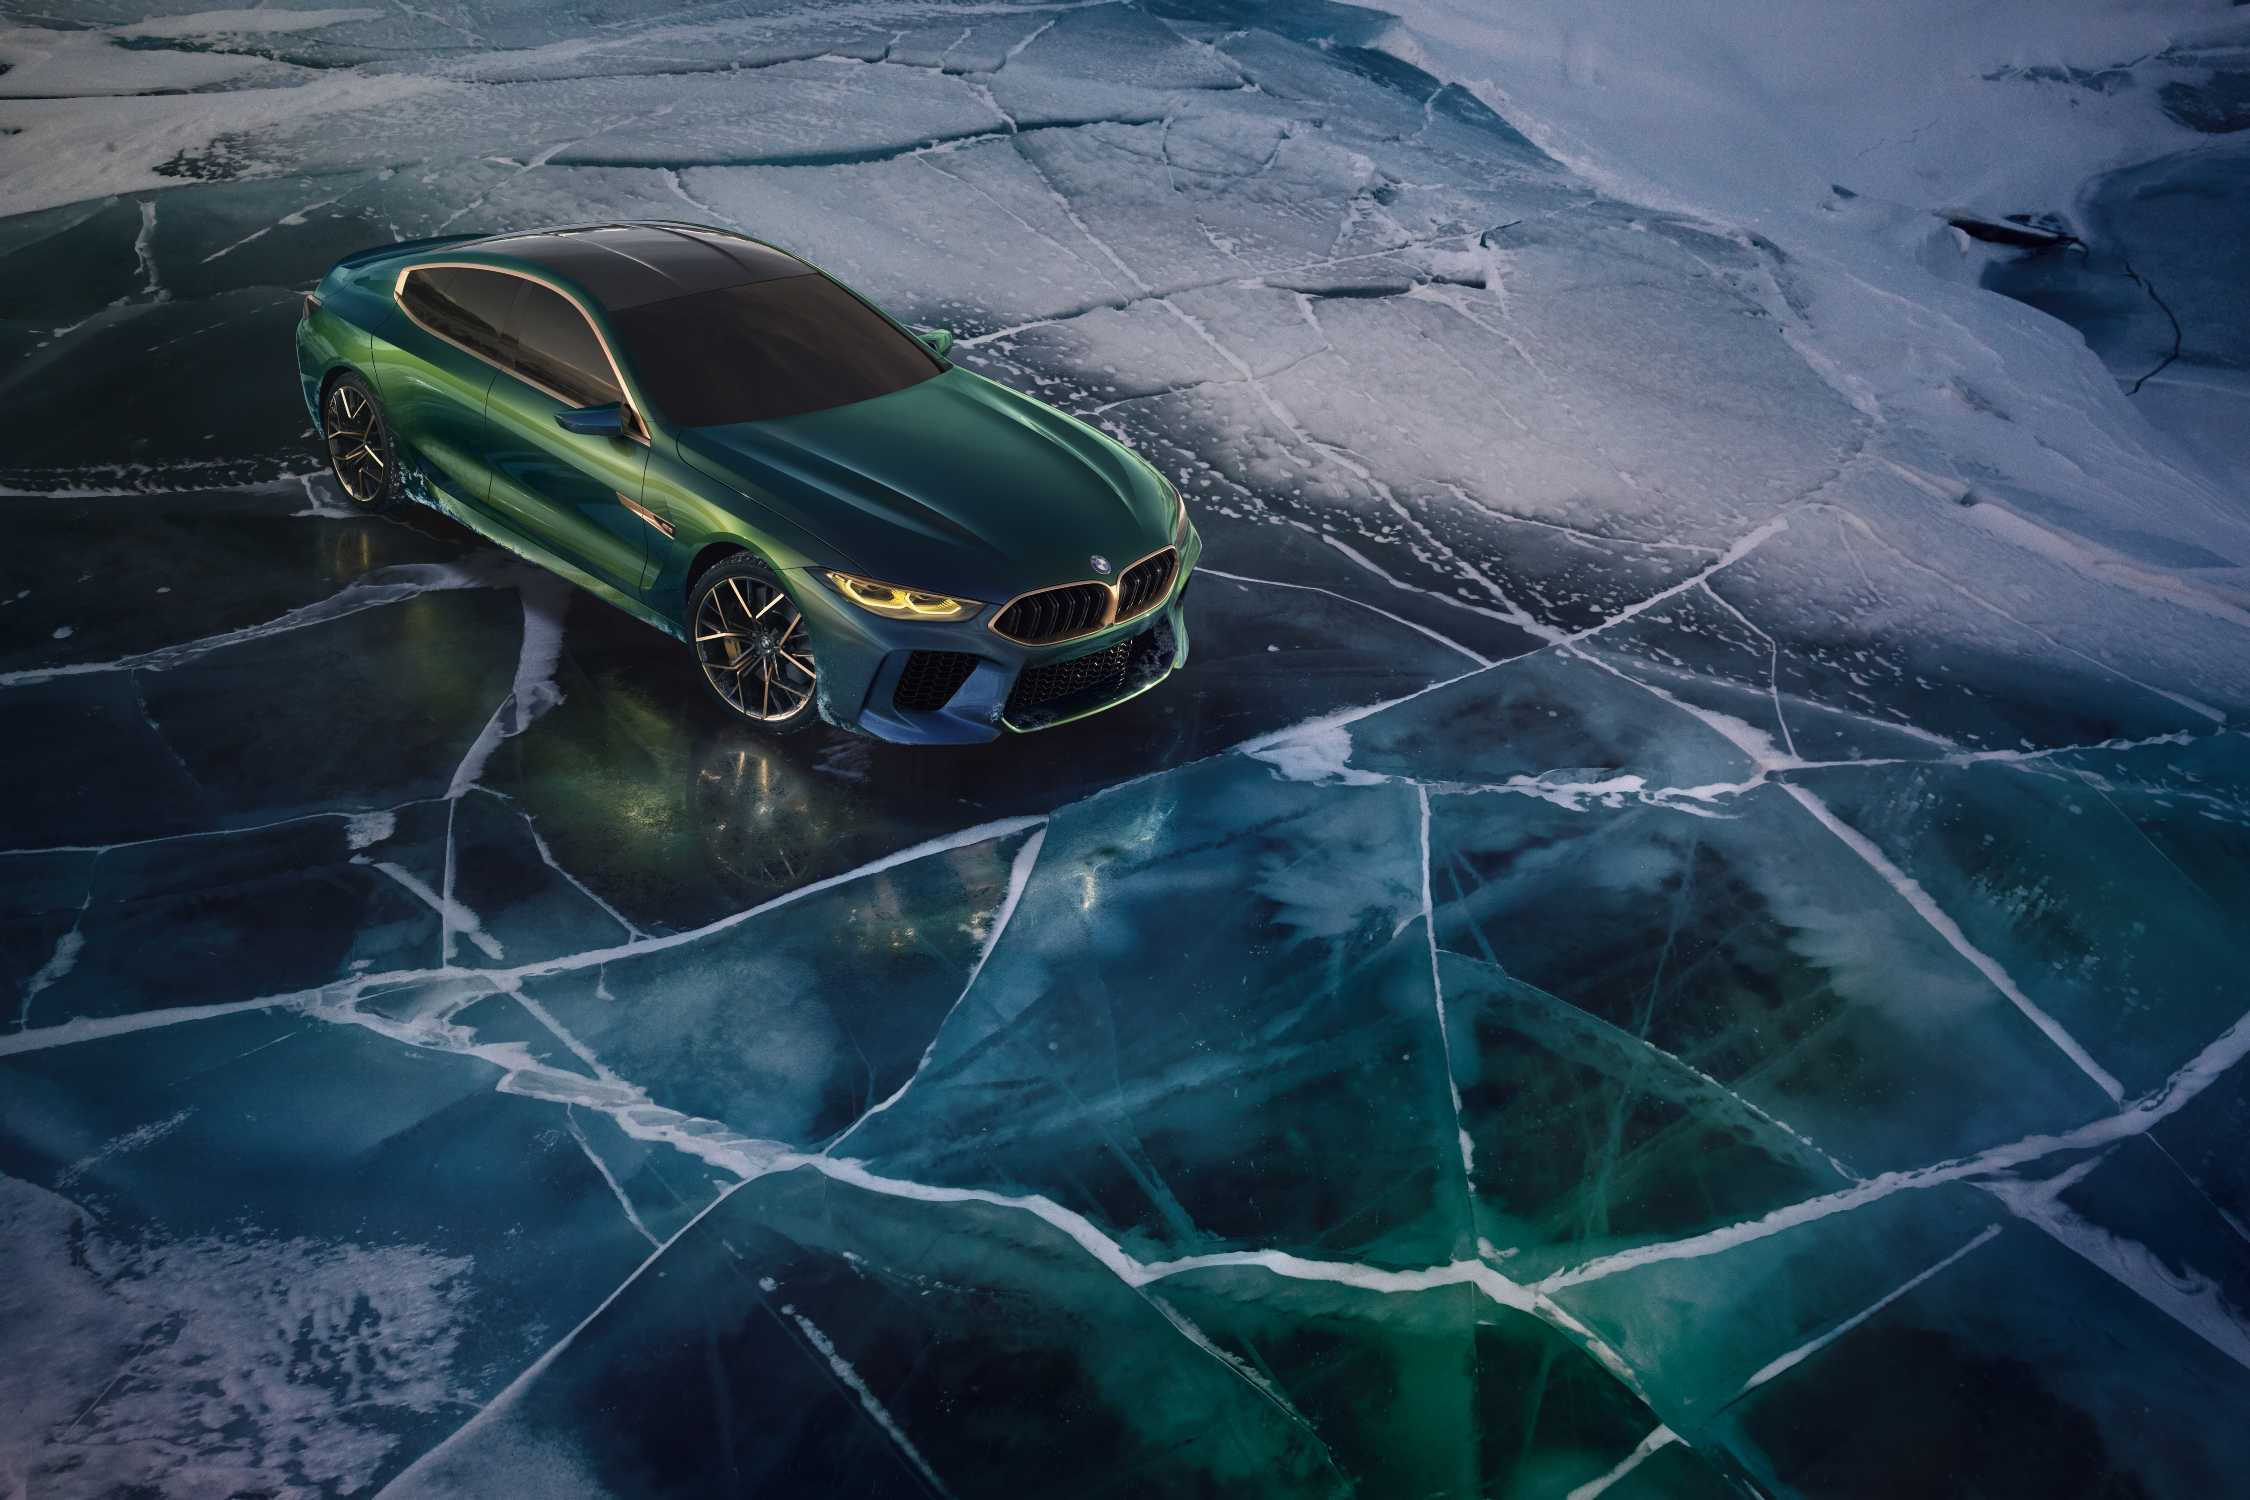 The Bmw Concept M8 Gran Coupe Showcases A New Interpretation Of